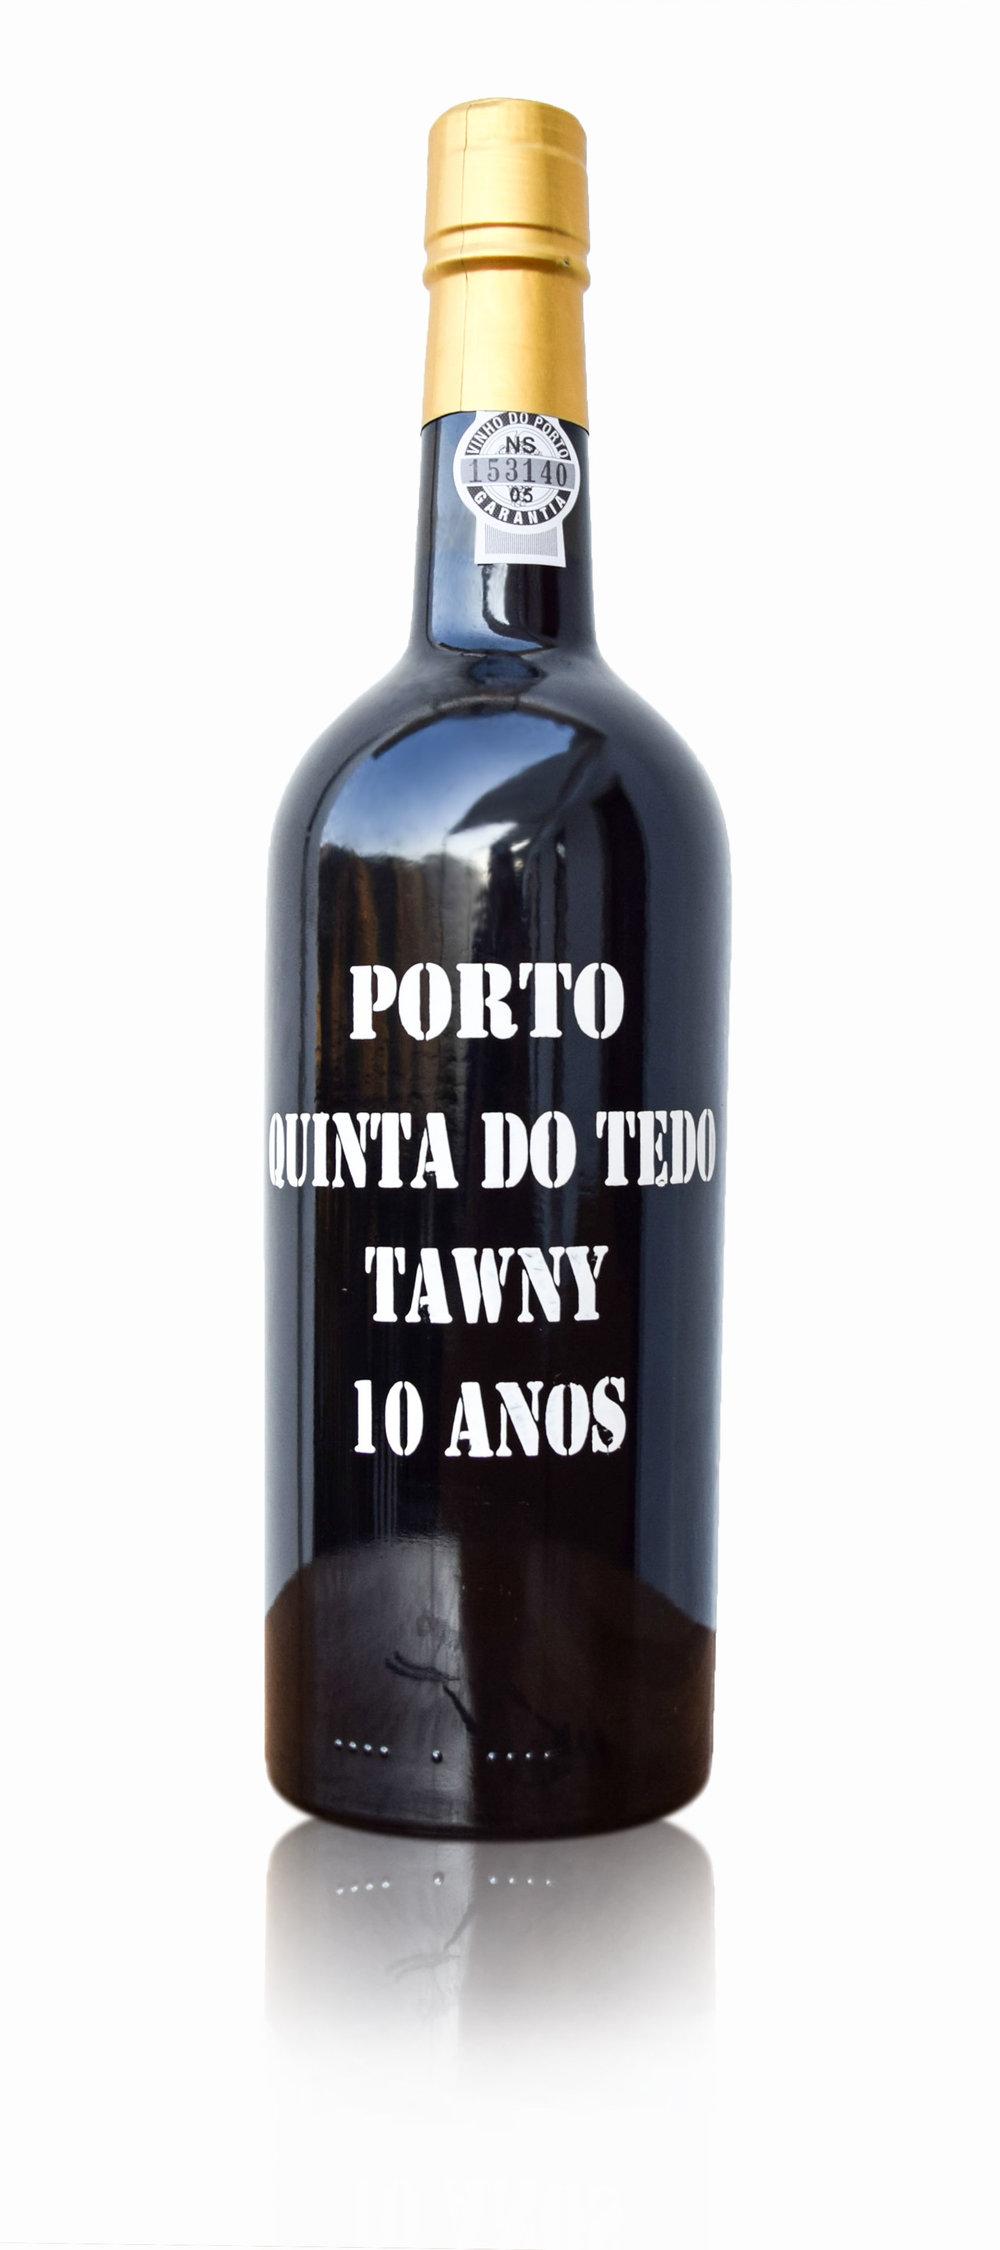 10-year-tawny-anos-porto-wine-douro